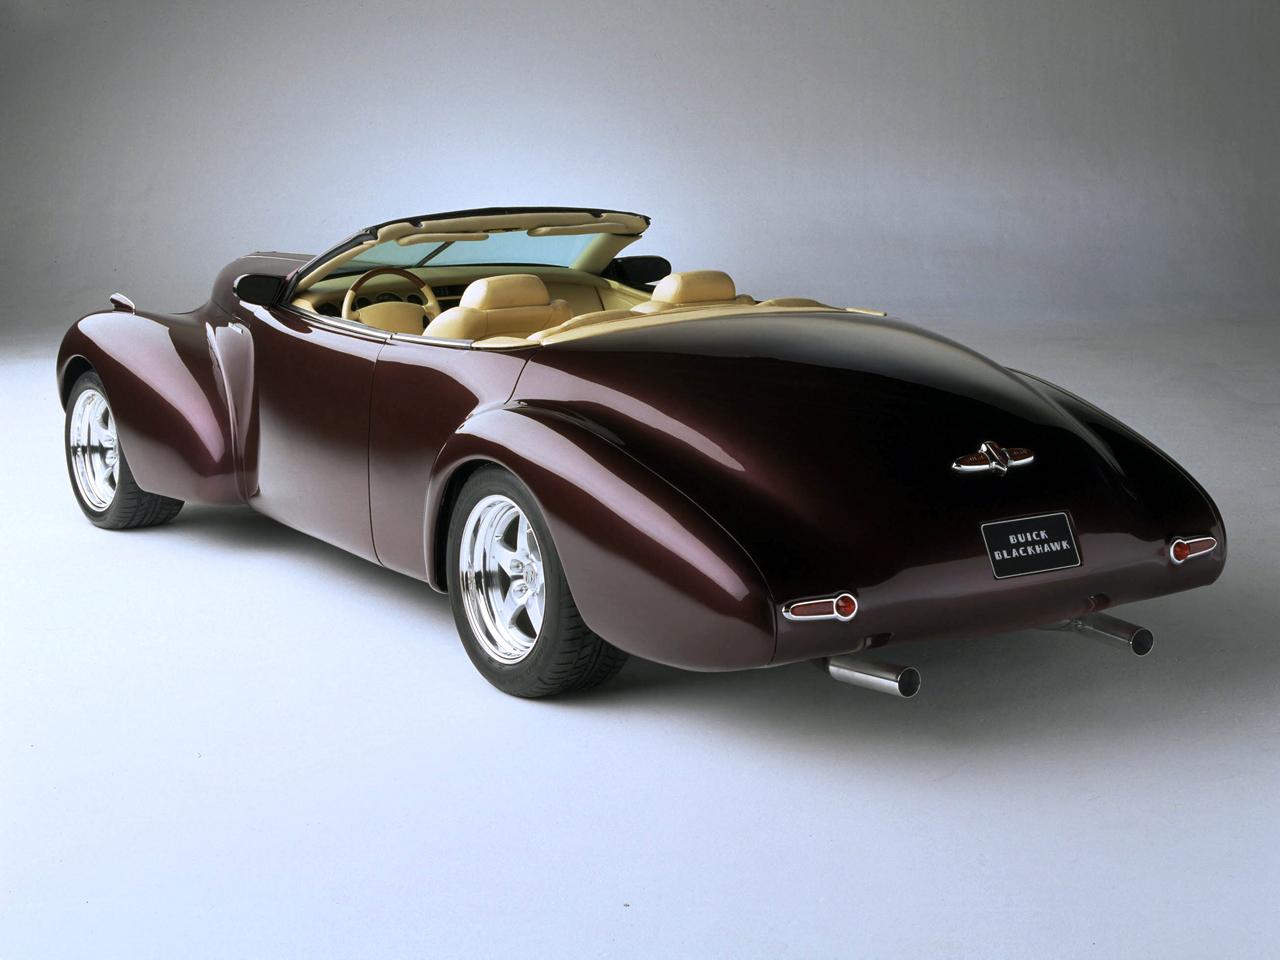 2000 Buick Blackhawk Concepts